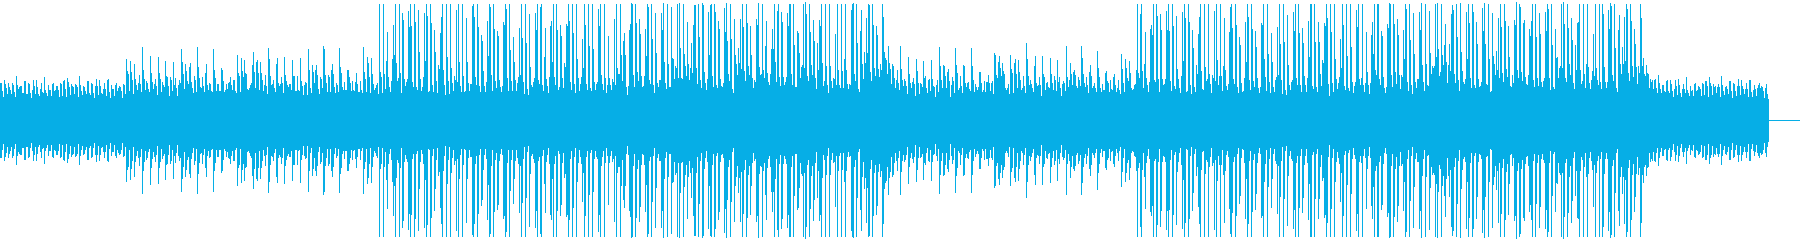 Lo-Fi Pianoの再生済みの波形